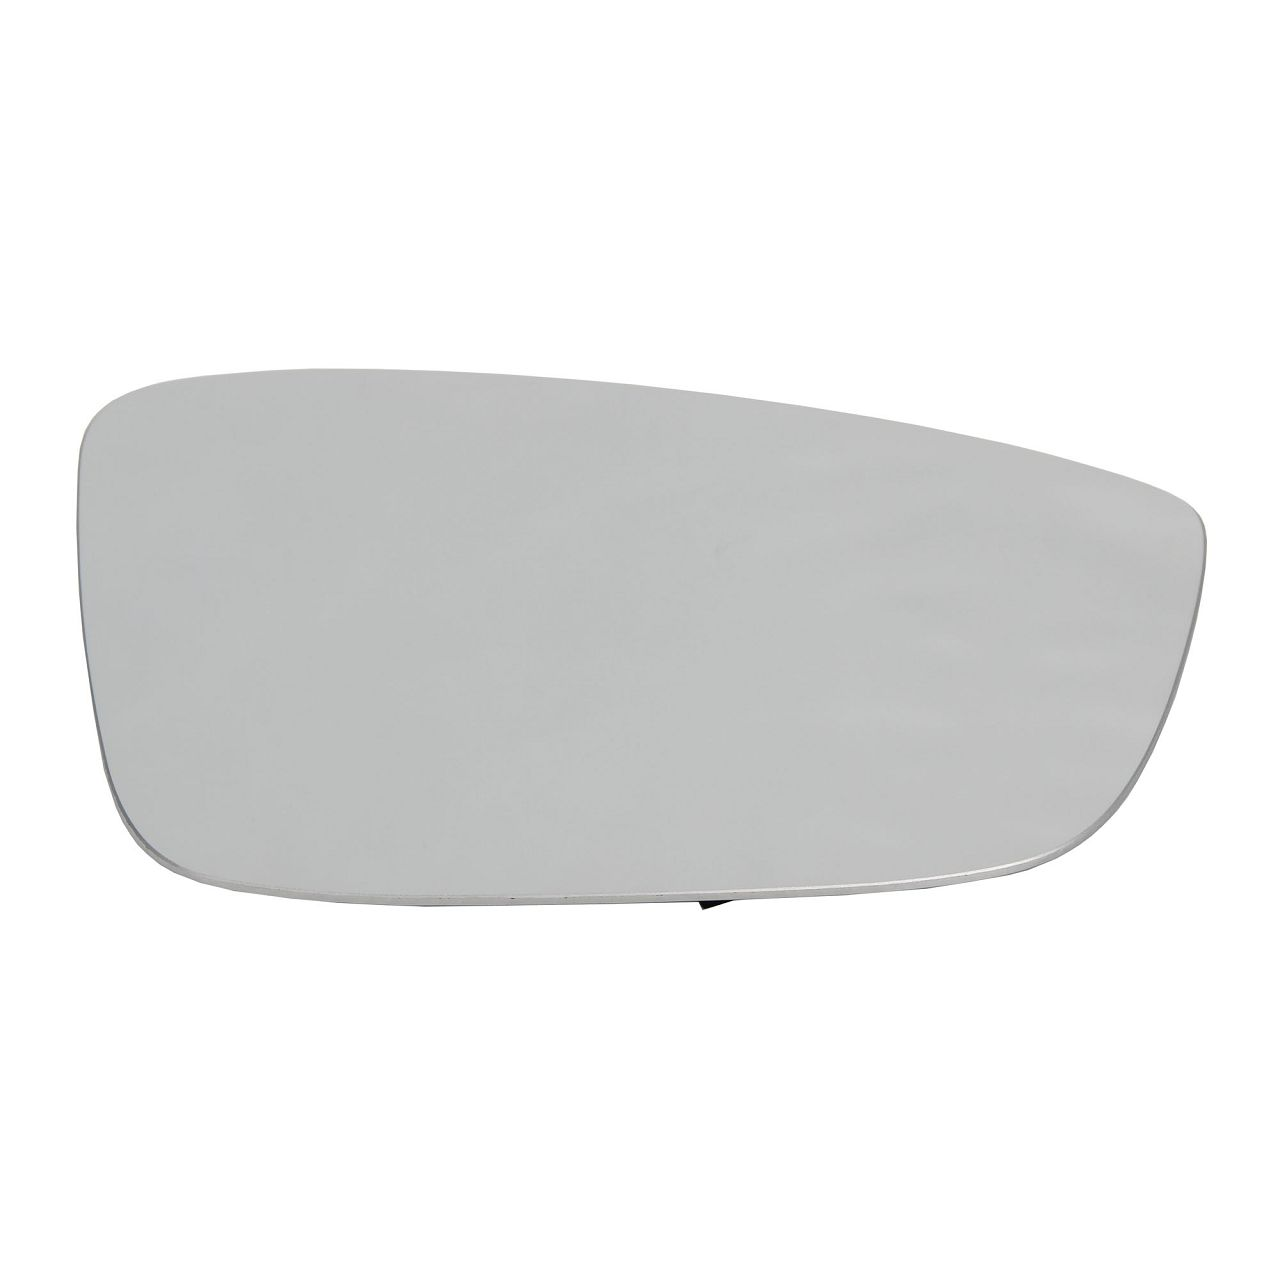 Außenspiegel Spiegelglas SKODA Citigo VW Polo 6R1 6C1 Up rechts 6R0857522F